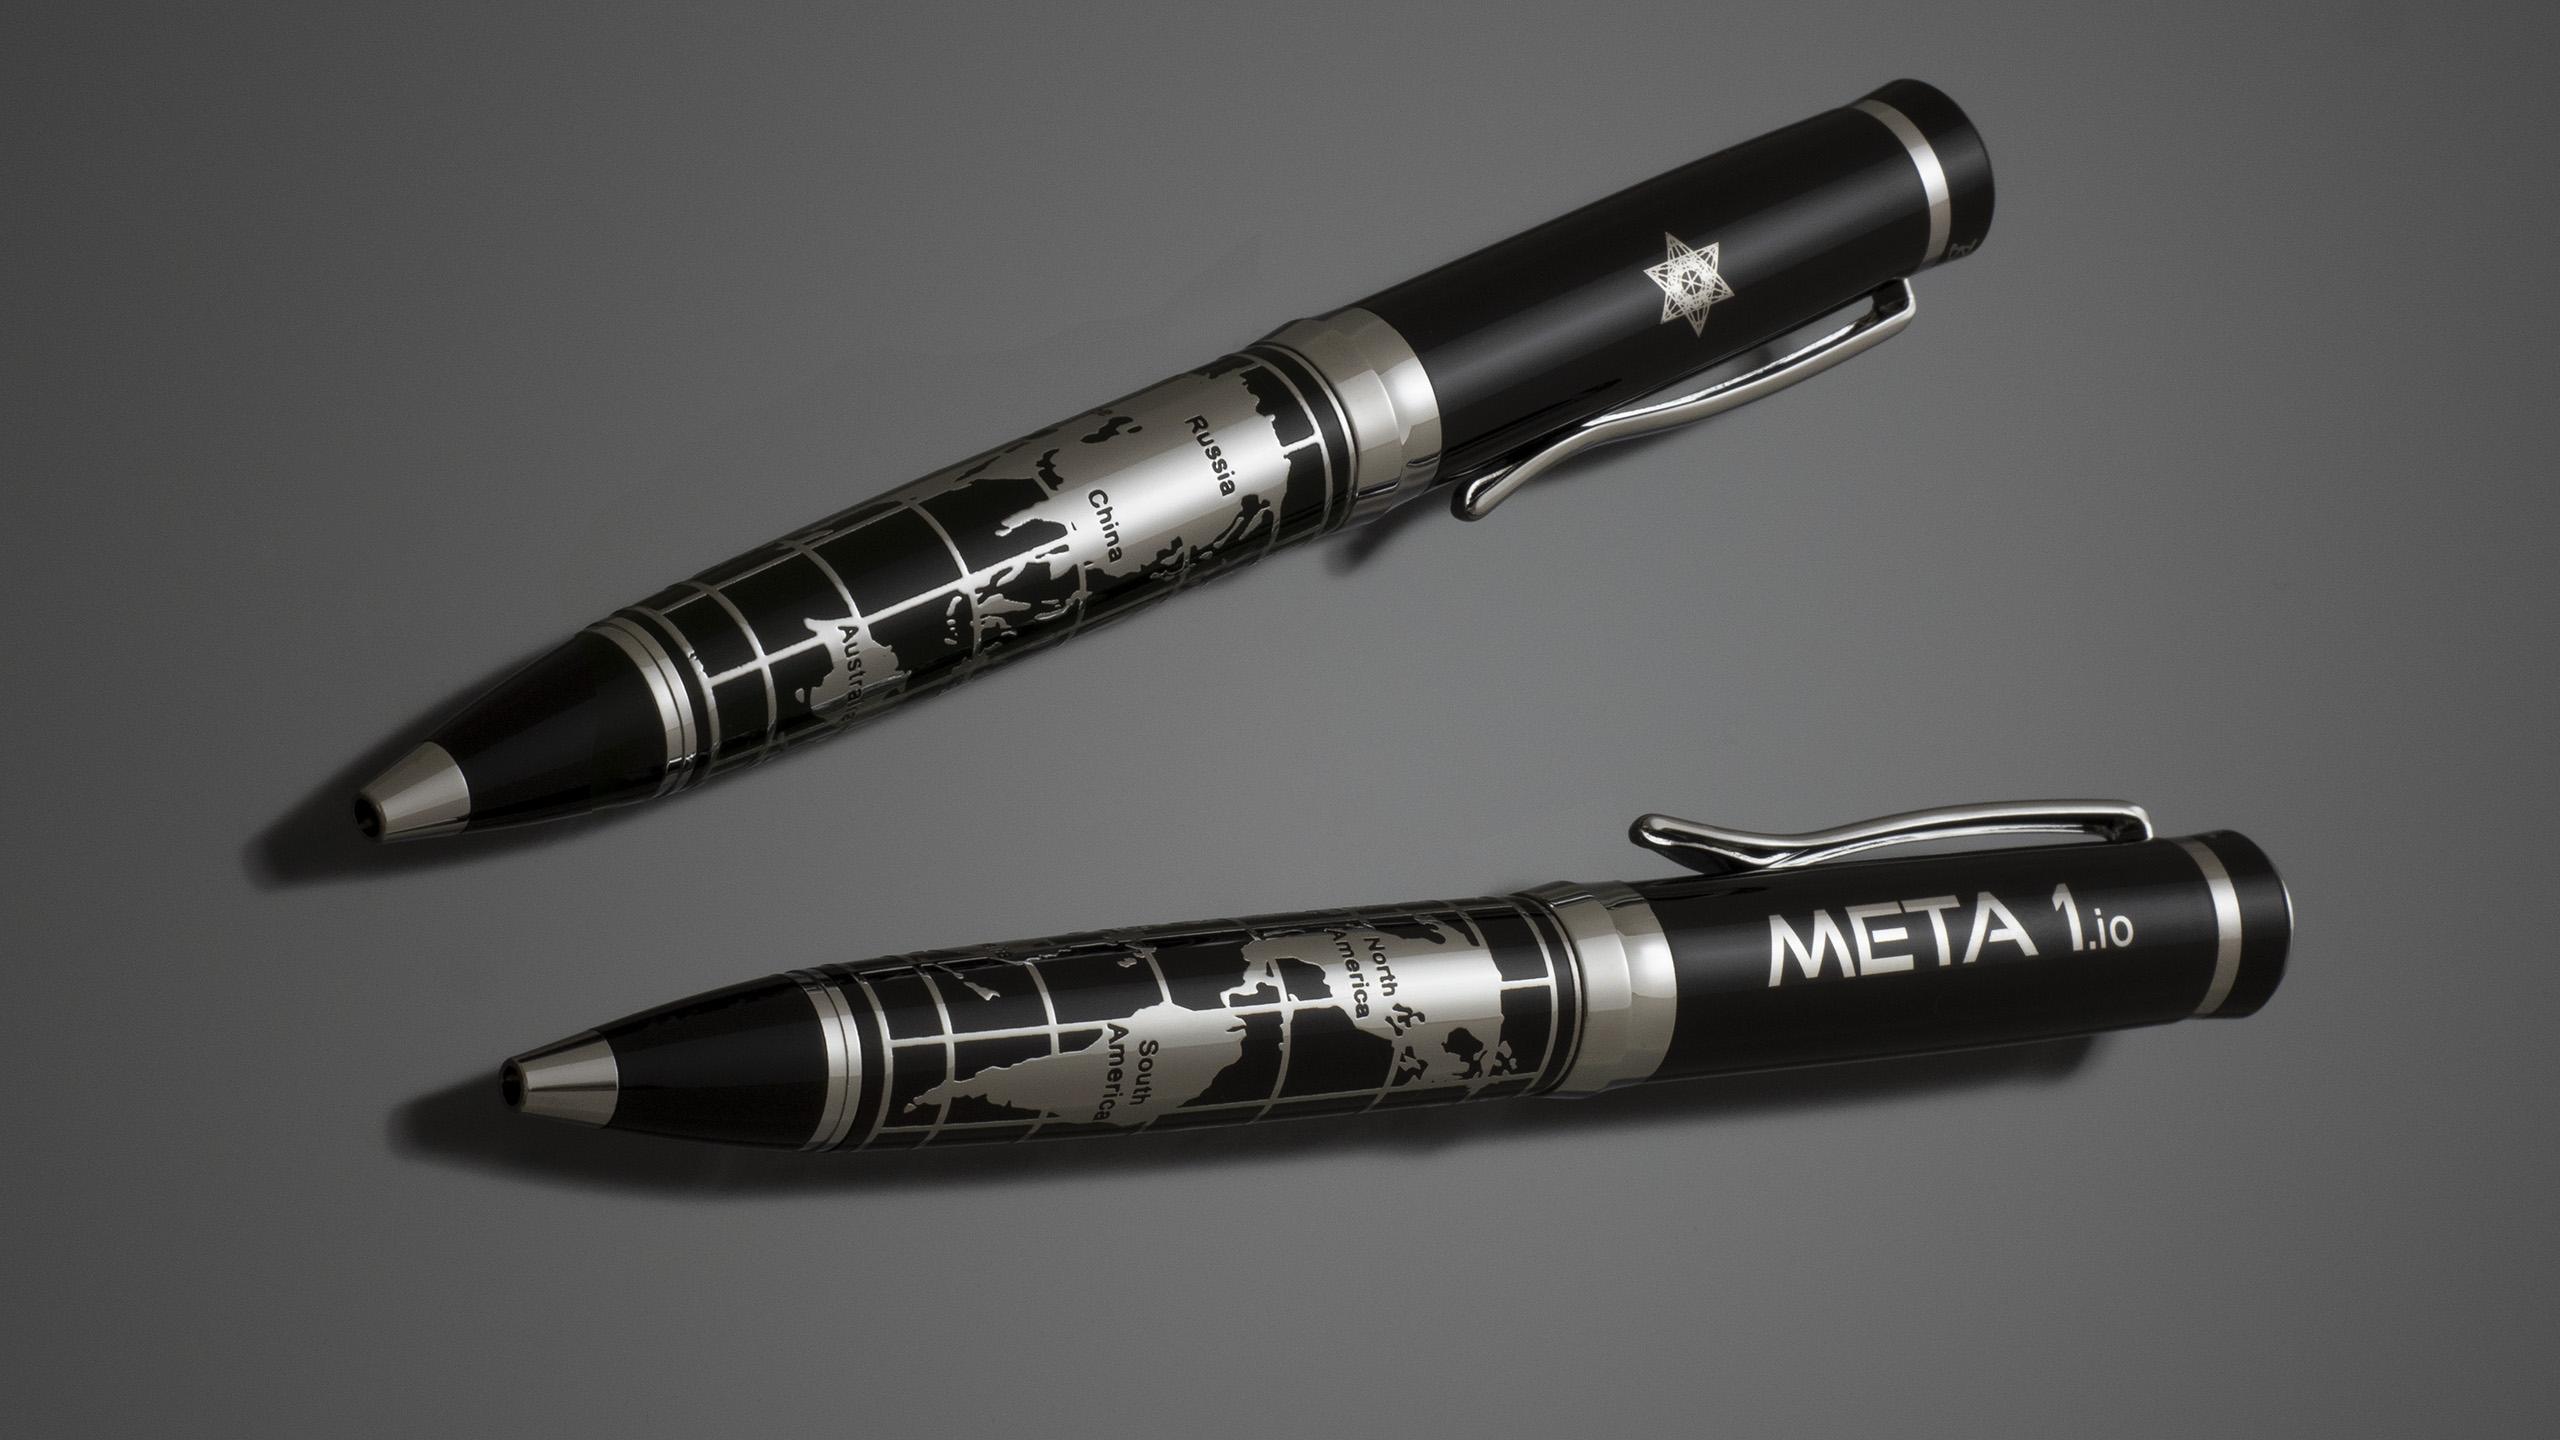 pens_cropped_producy_photo_P8030559_2560p